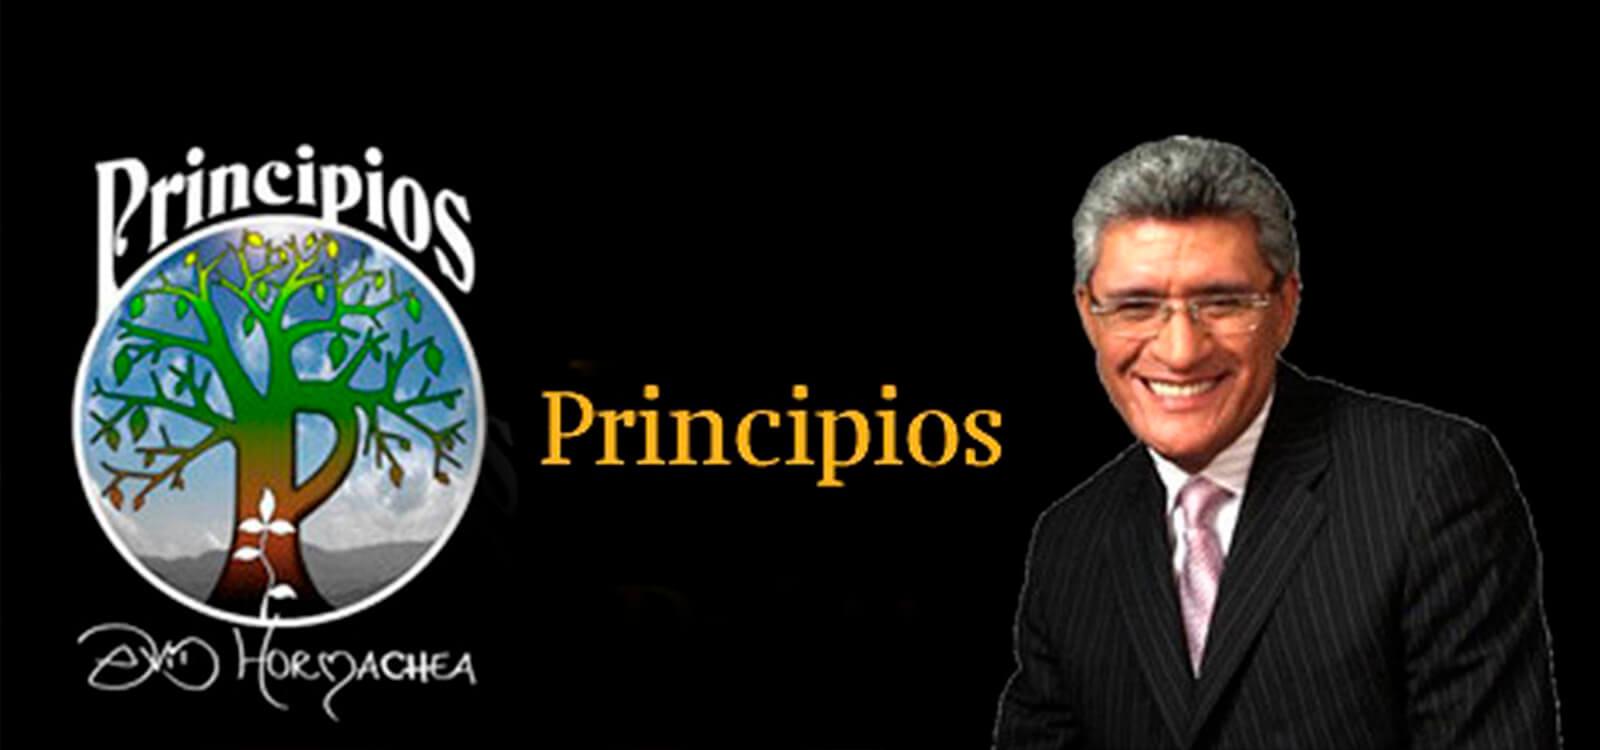 principios david hormachea